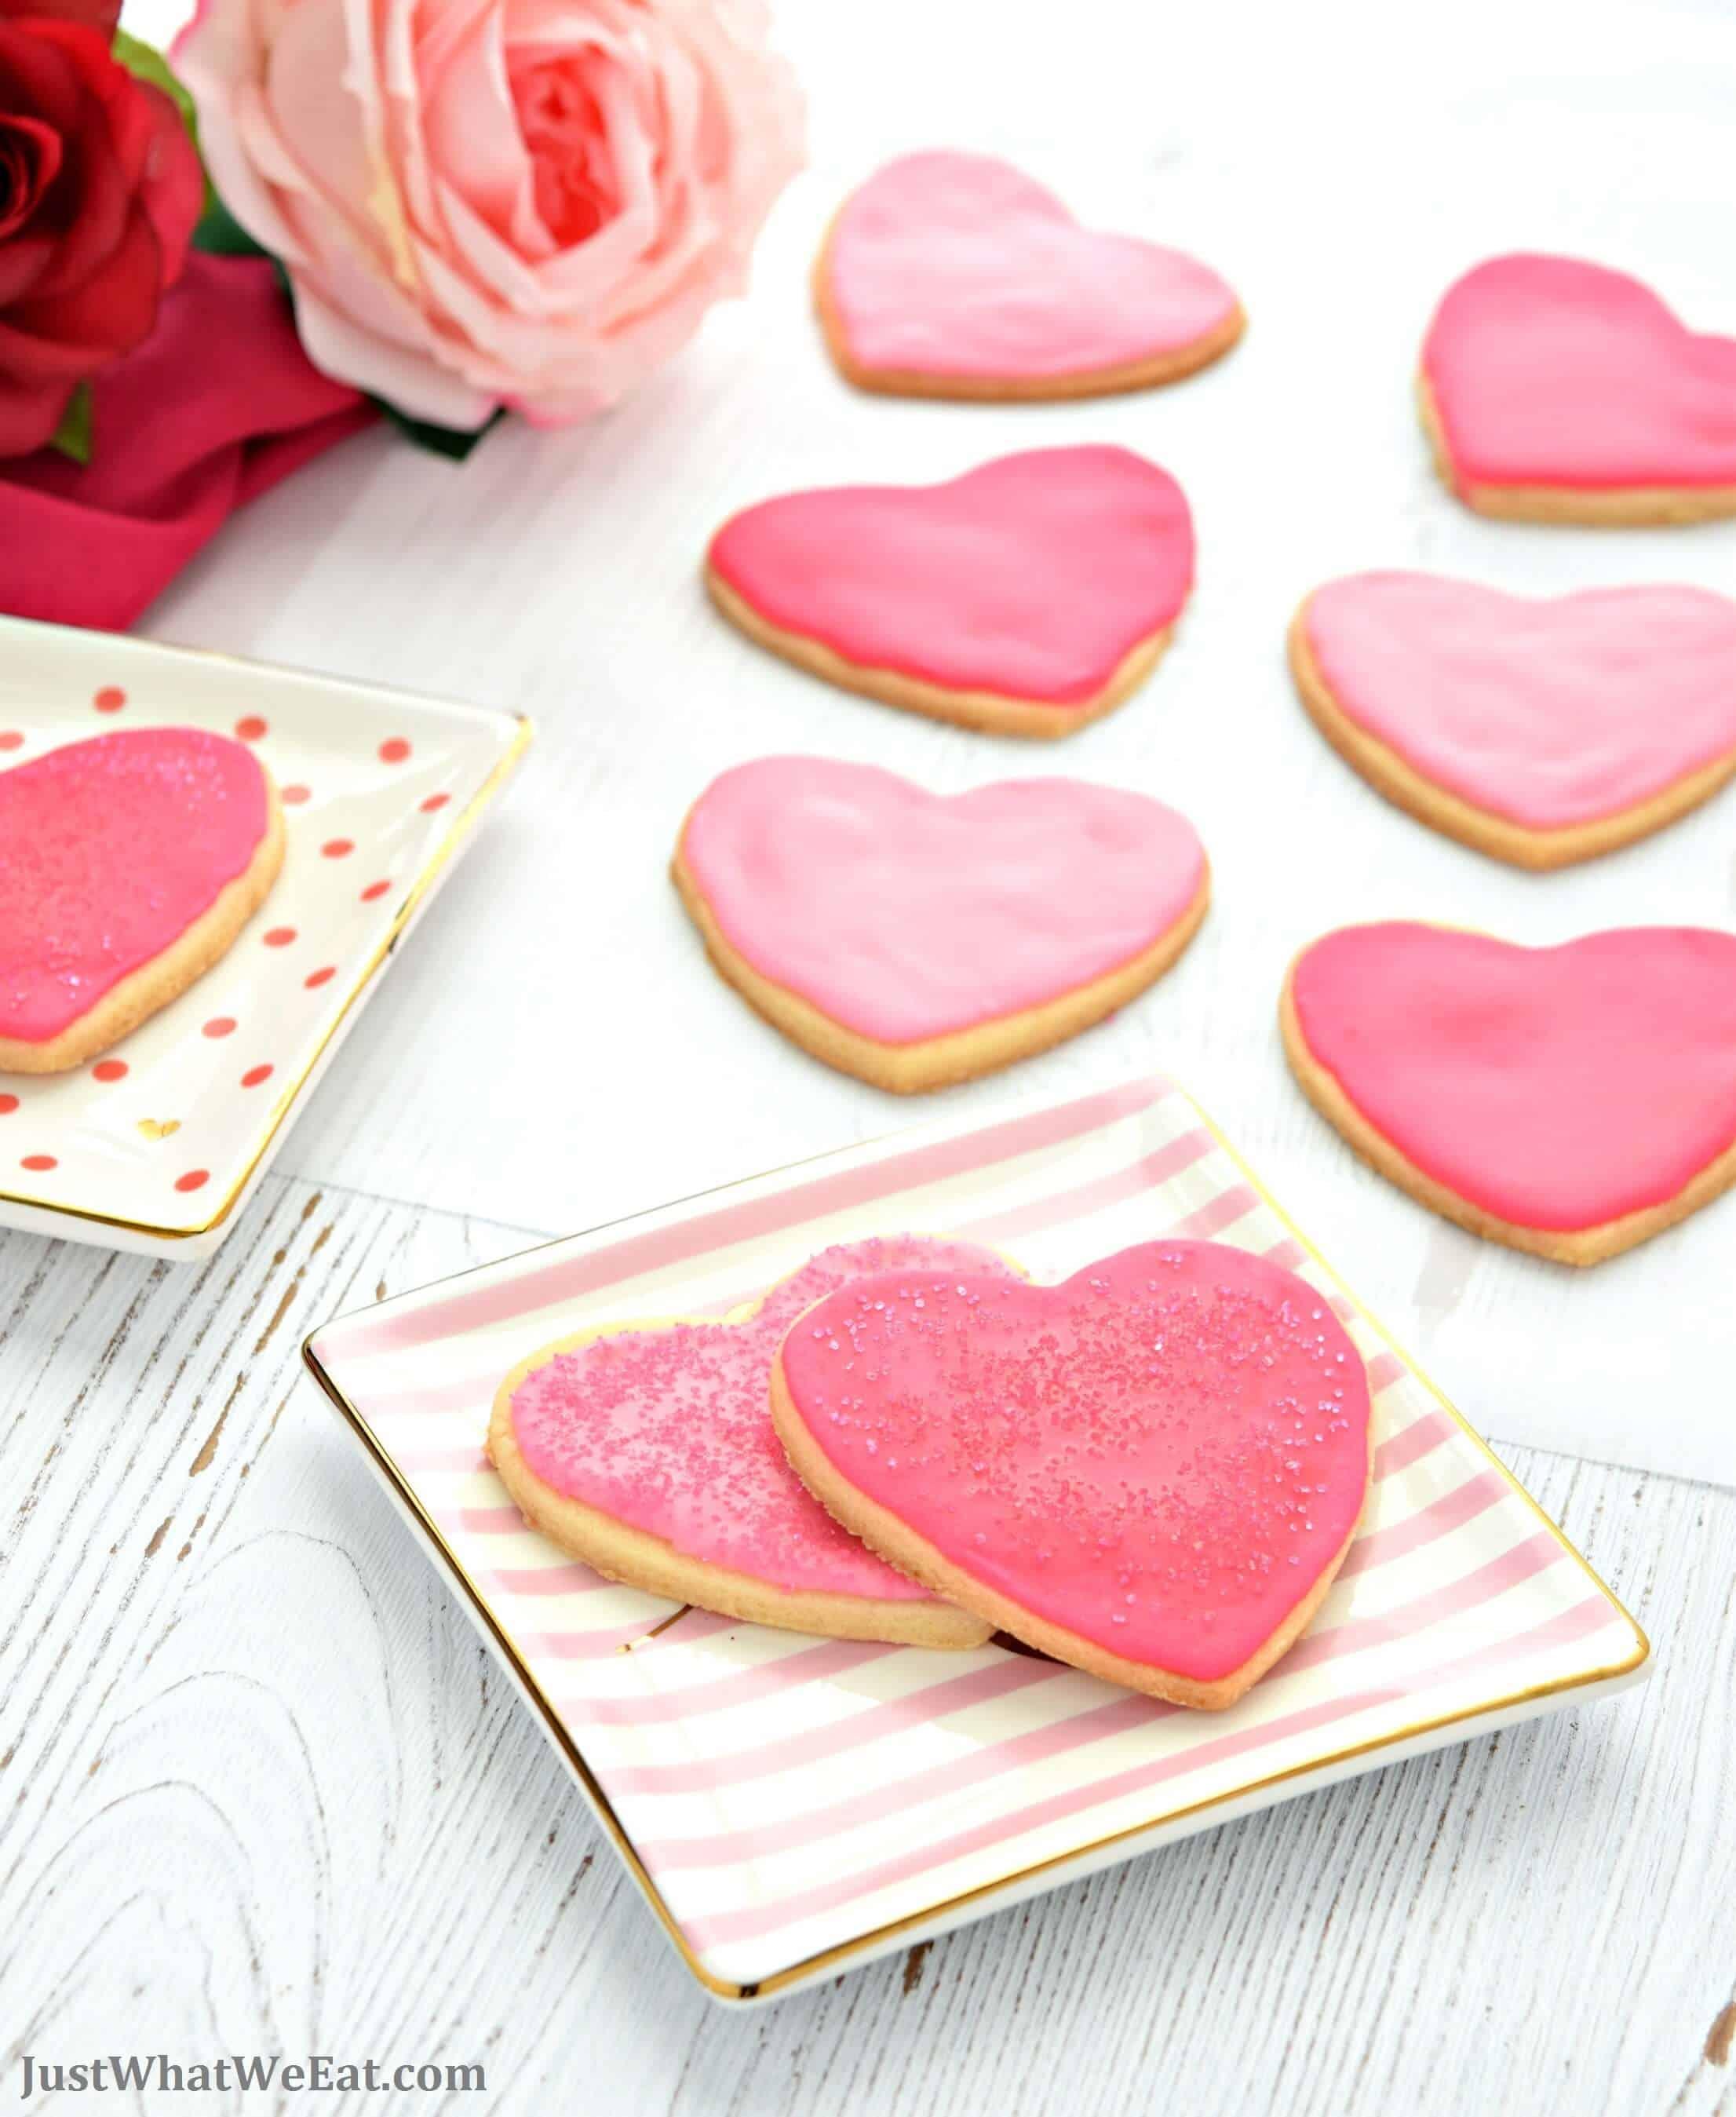 Valentine's Day Cut Out Cookies - Gluten Free, Vegan